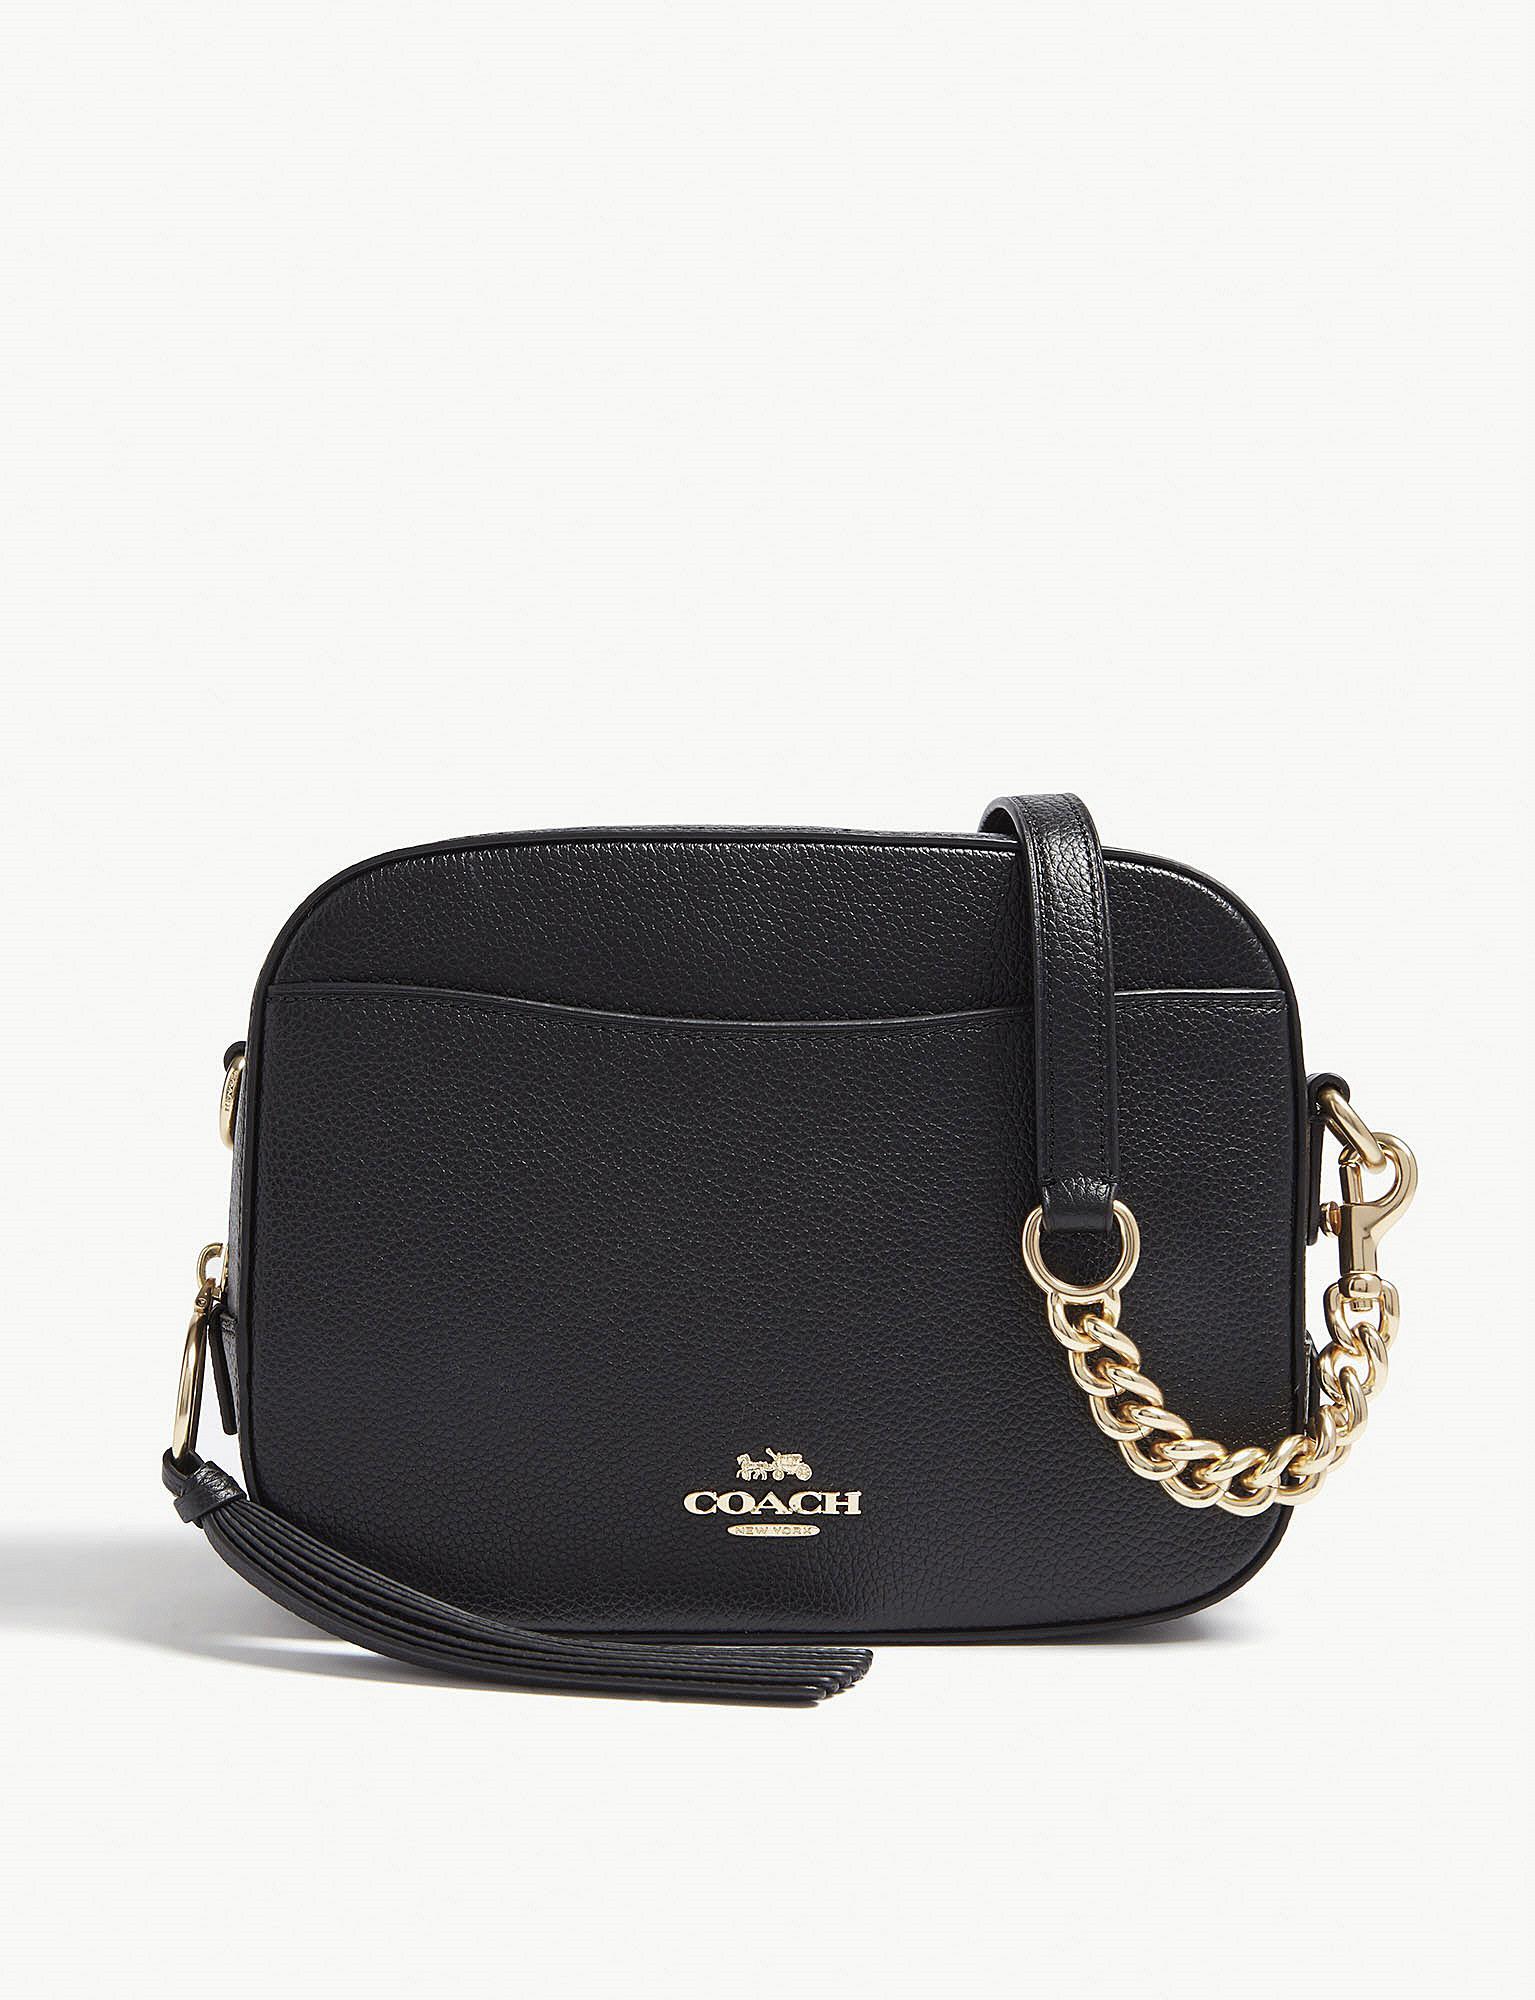 7a7b5c38c7 COACH - Ladies Black Leather Camera Bag - Lyst. View fullscreen